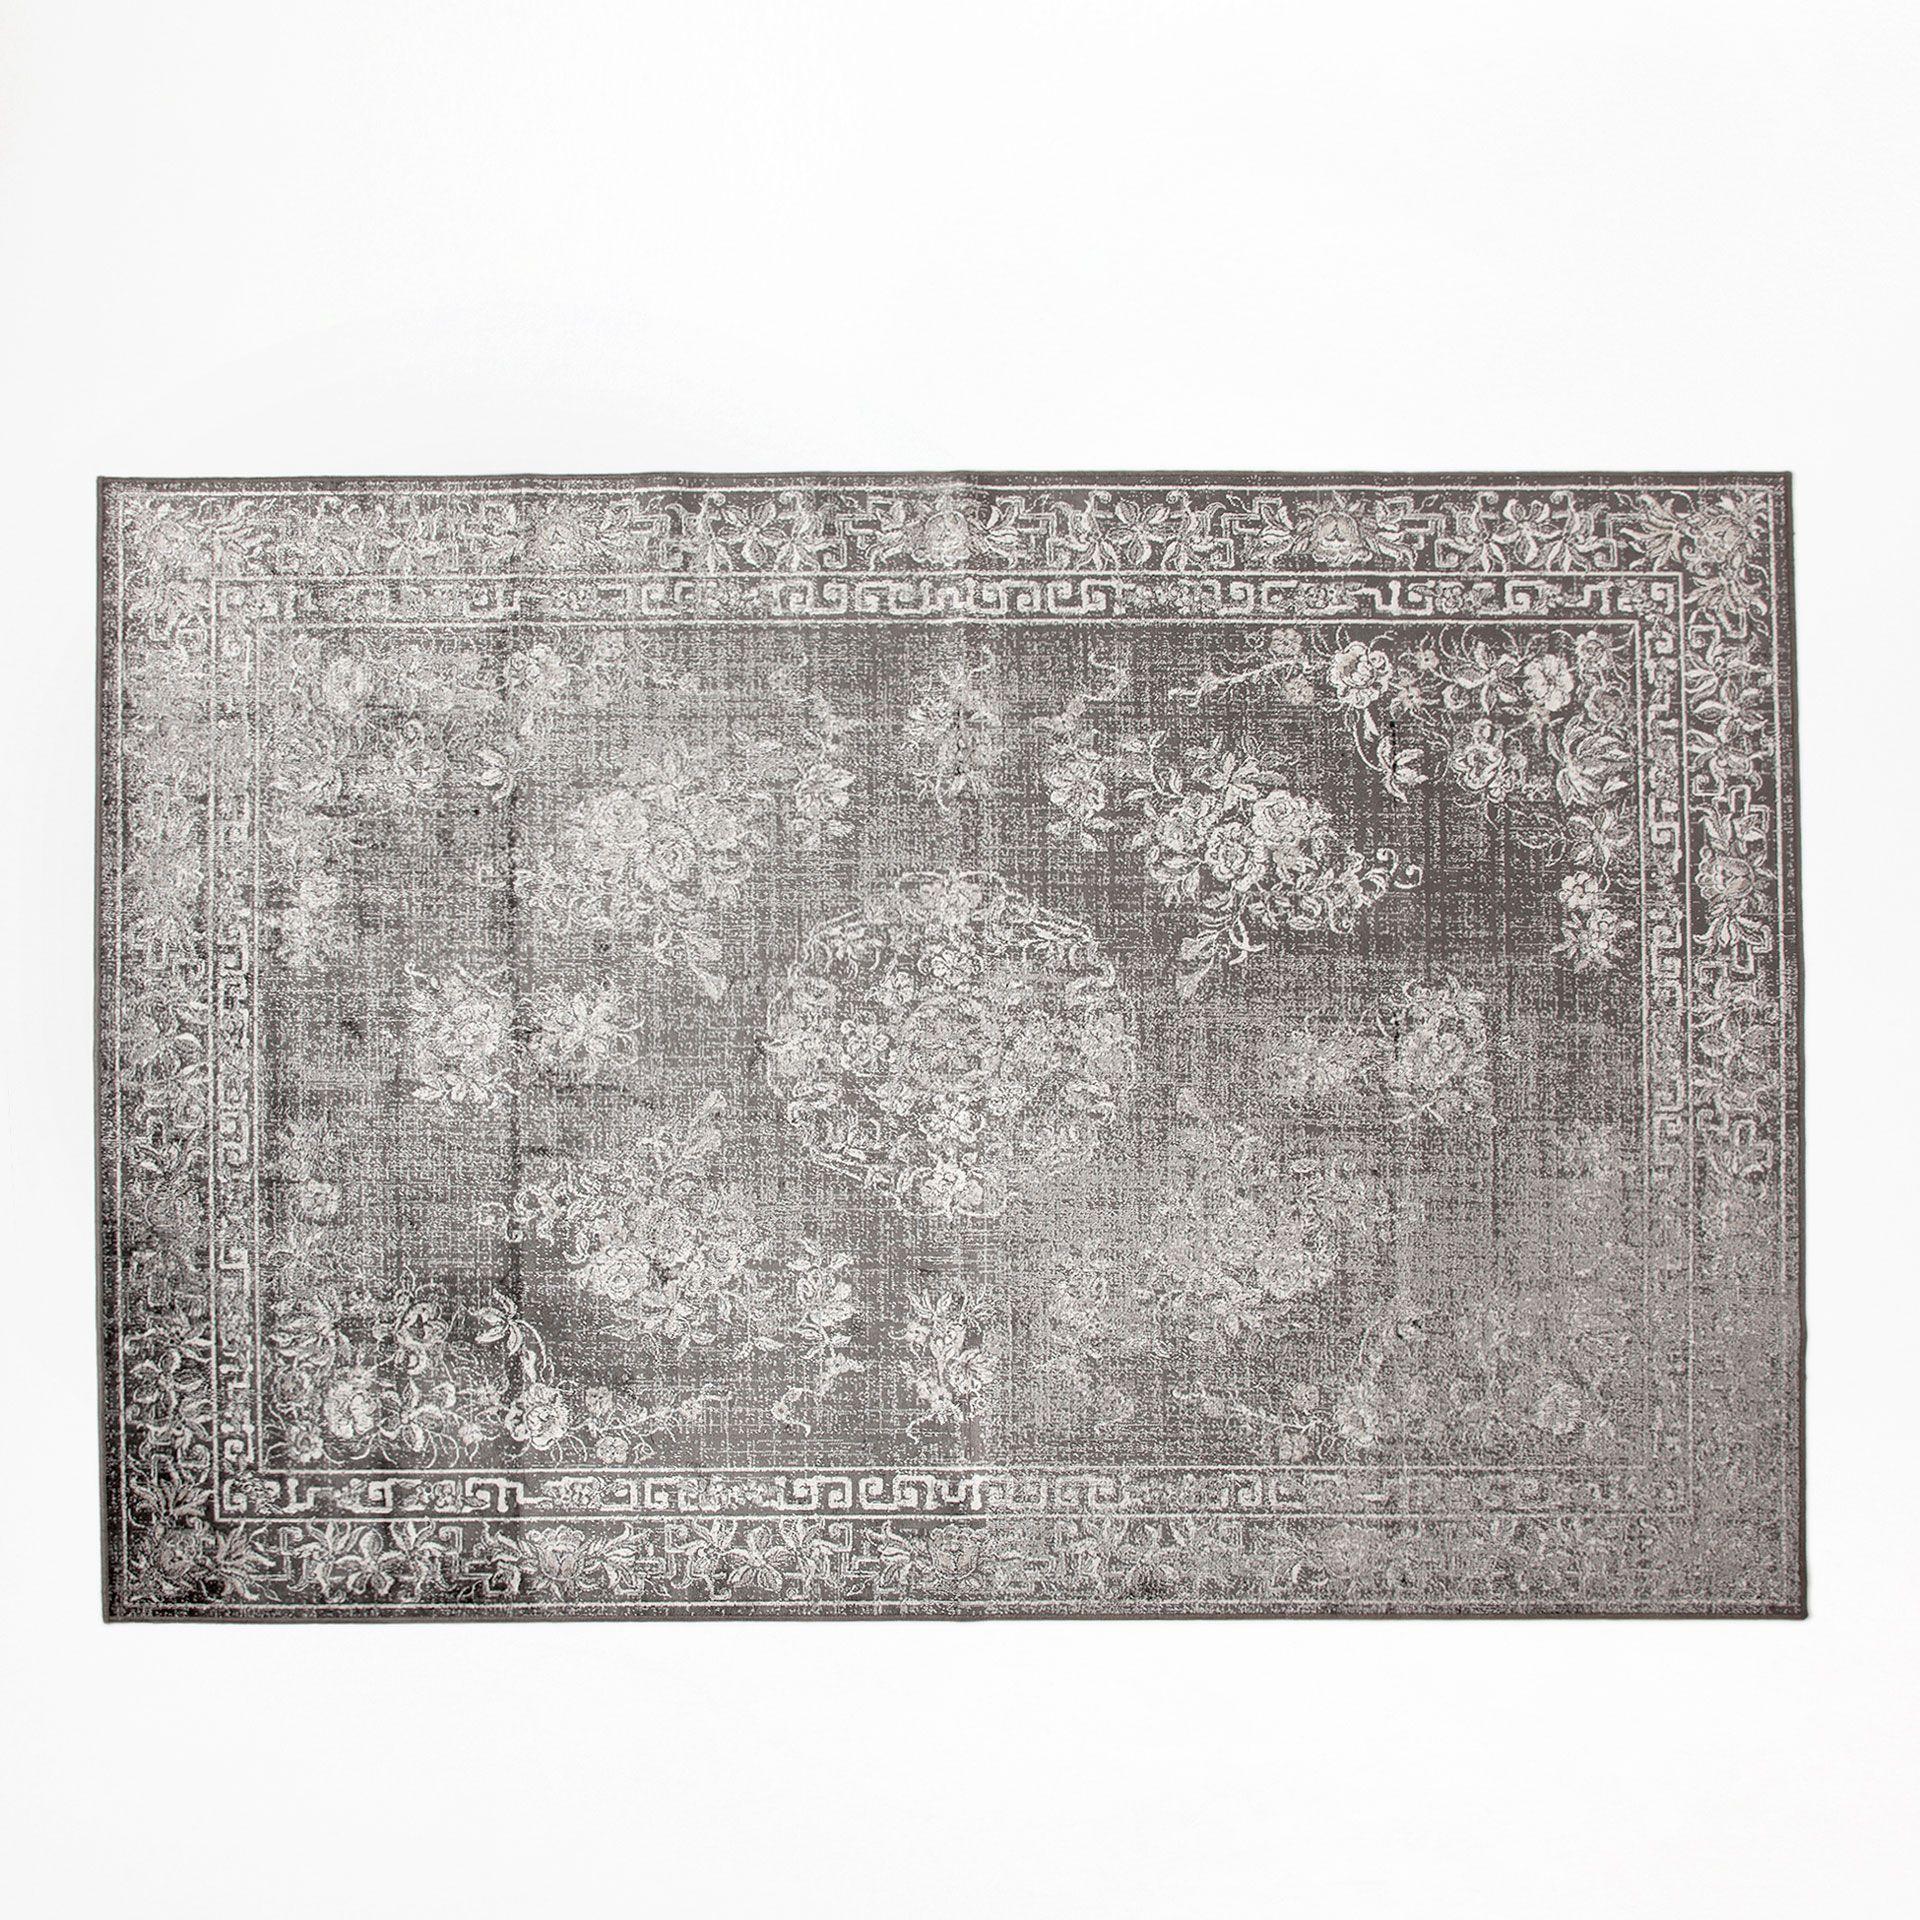 Image 2 of the product FLORALMOTIF RUG Matta